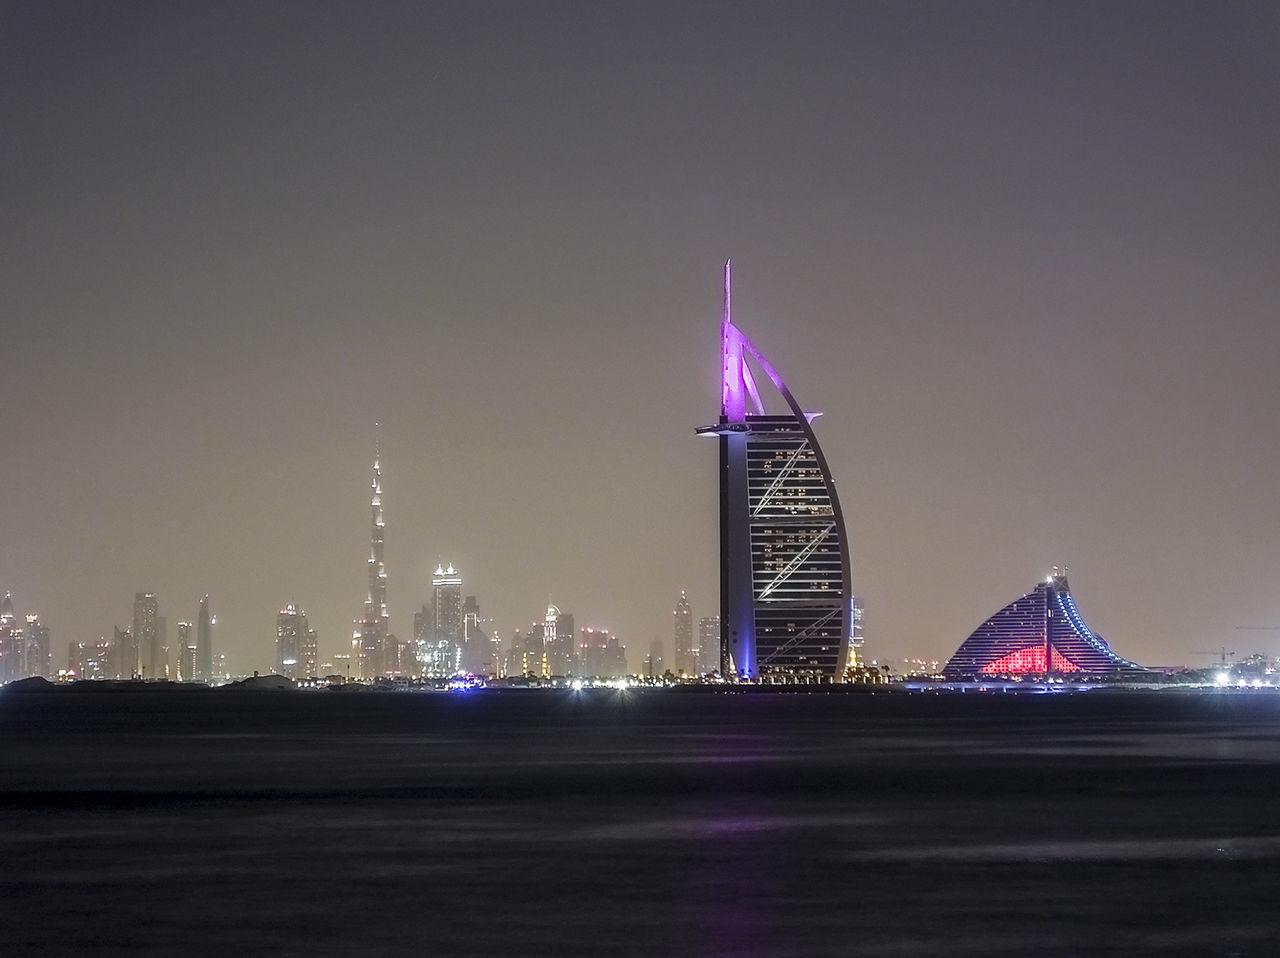 Burj Al Arab Night Lights Skyline Dubai Architecture Nightphotography The Architect - 2015 EyeEm Awards The Traveler - 2015 EyeEm Awards Seeing The Sights Cities At Night